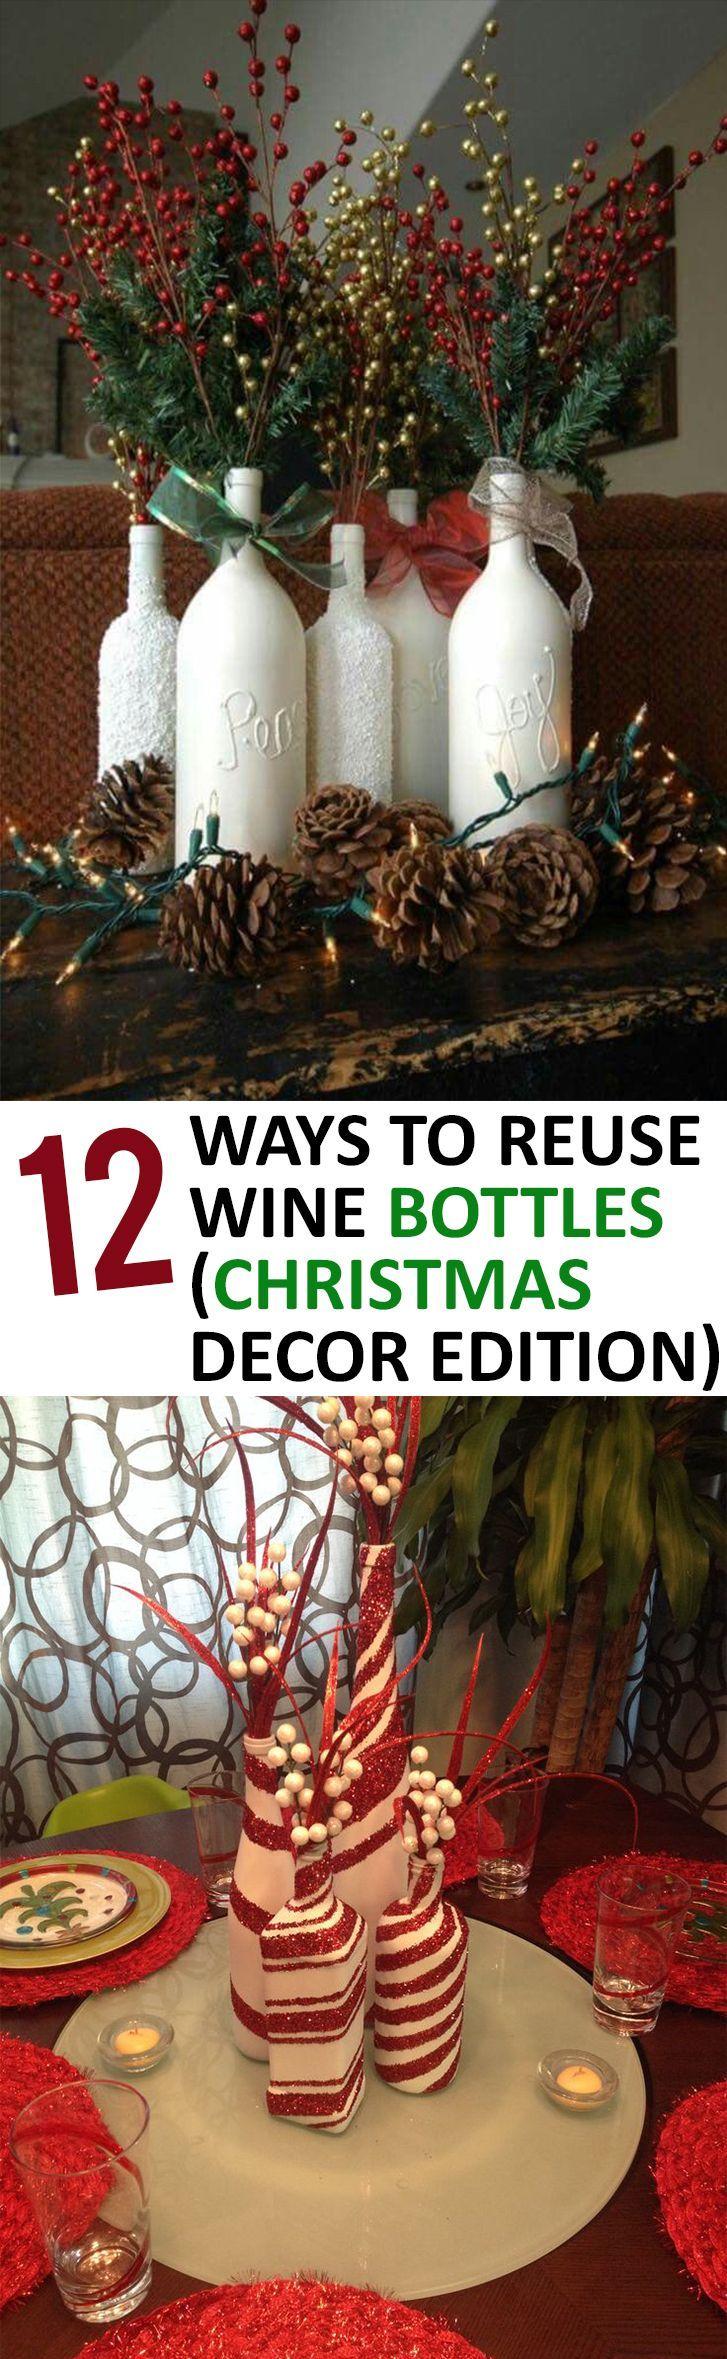 Bottle Christmas Decoration 12 Ways To Reuse Wine Bottles Christmas Decor Edition